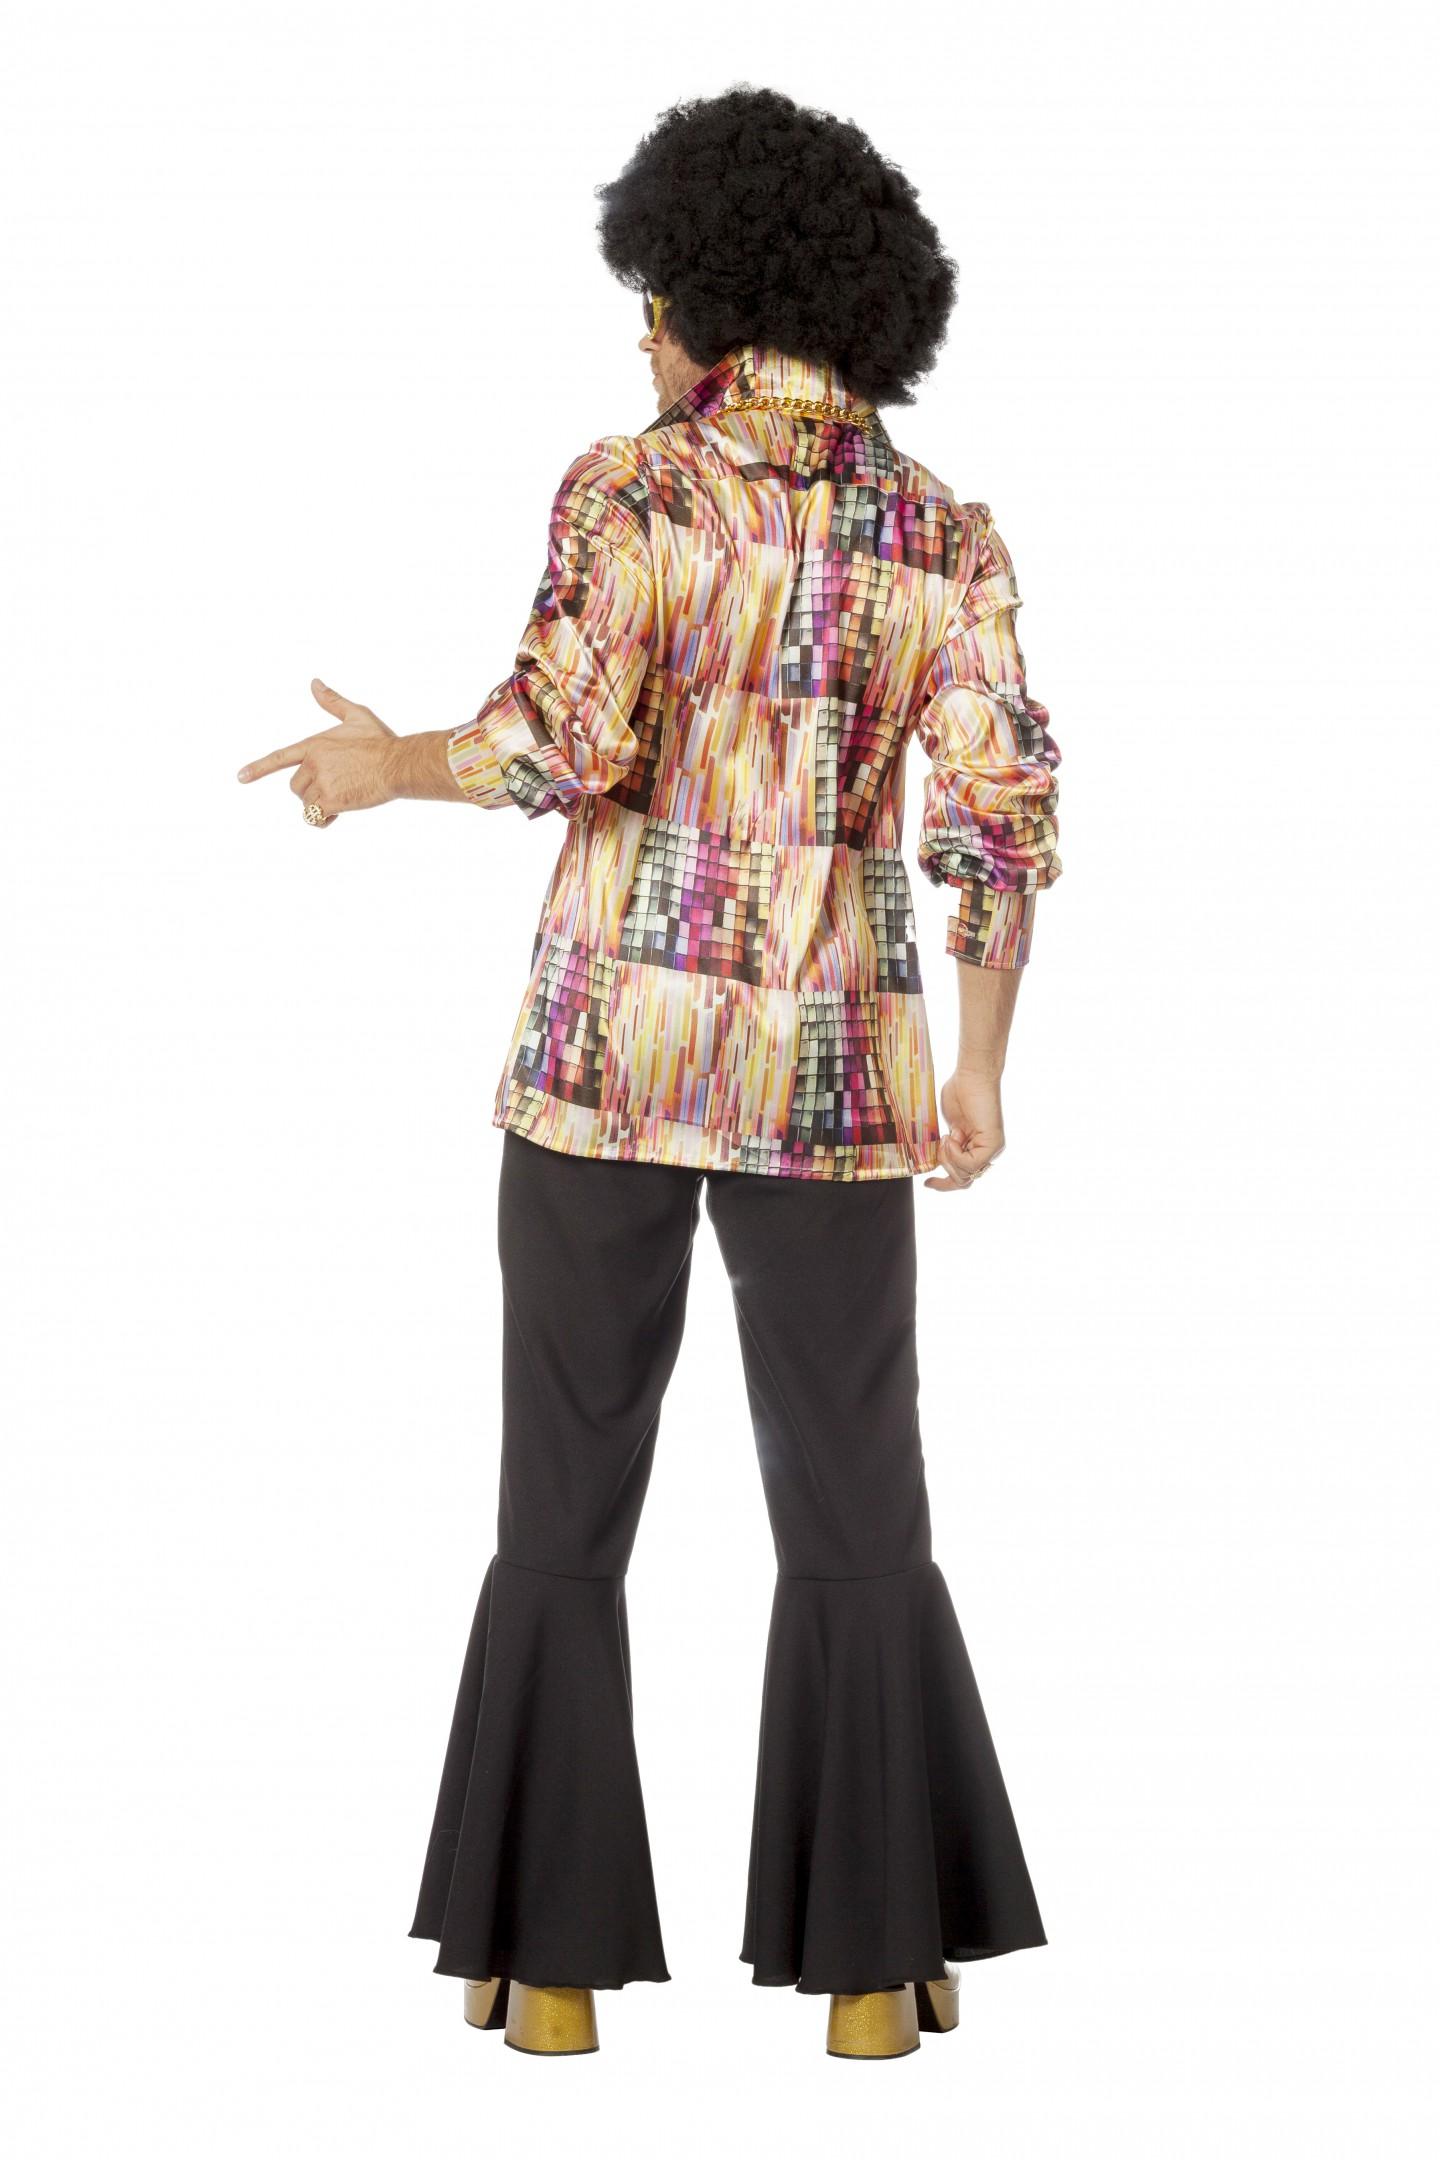 Disco shirt-227025